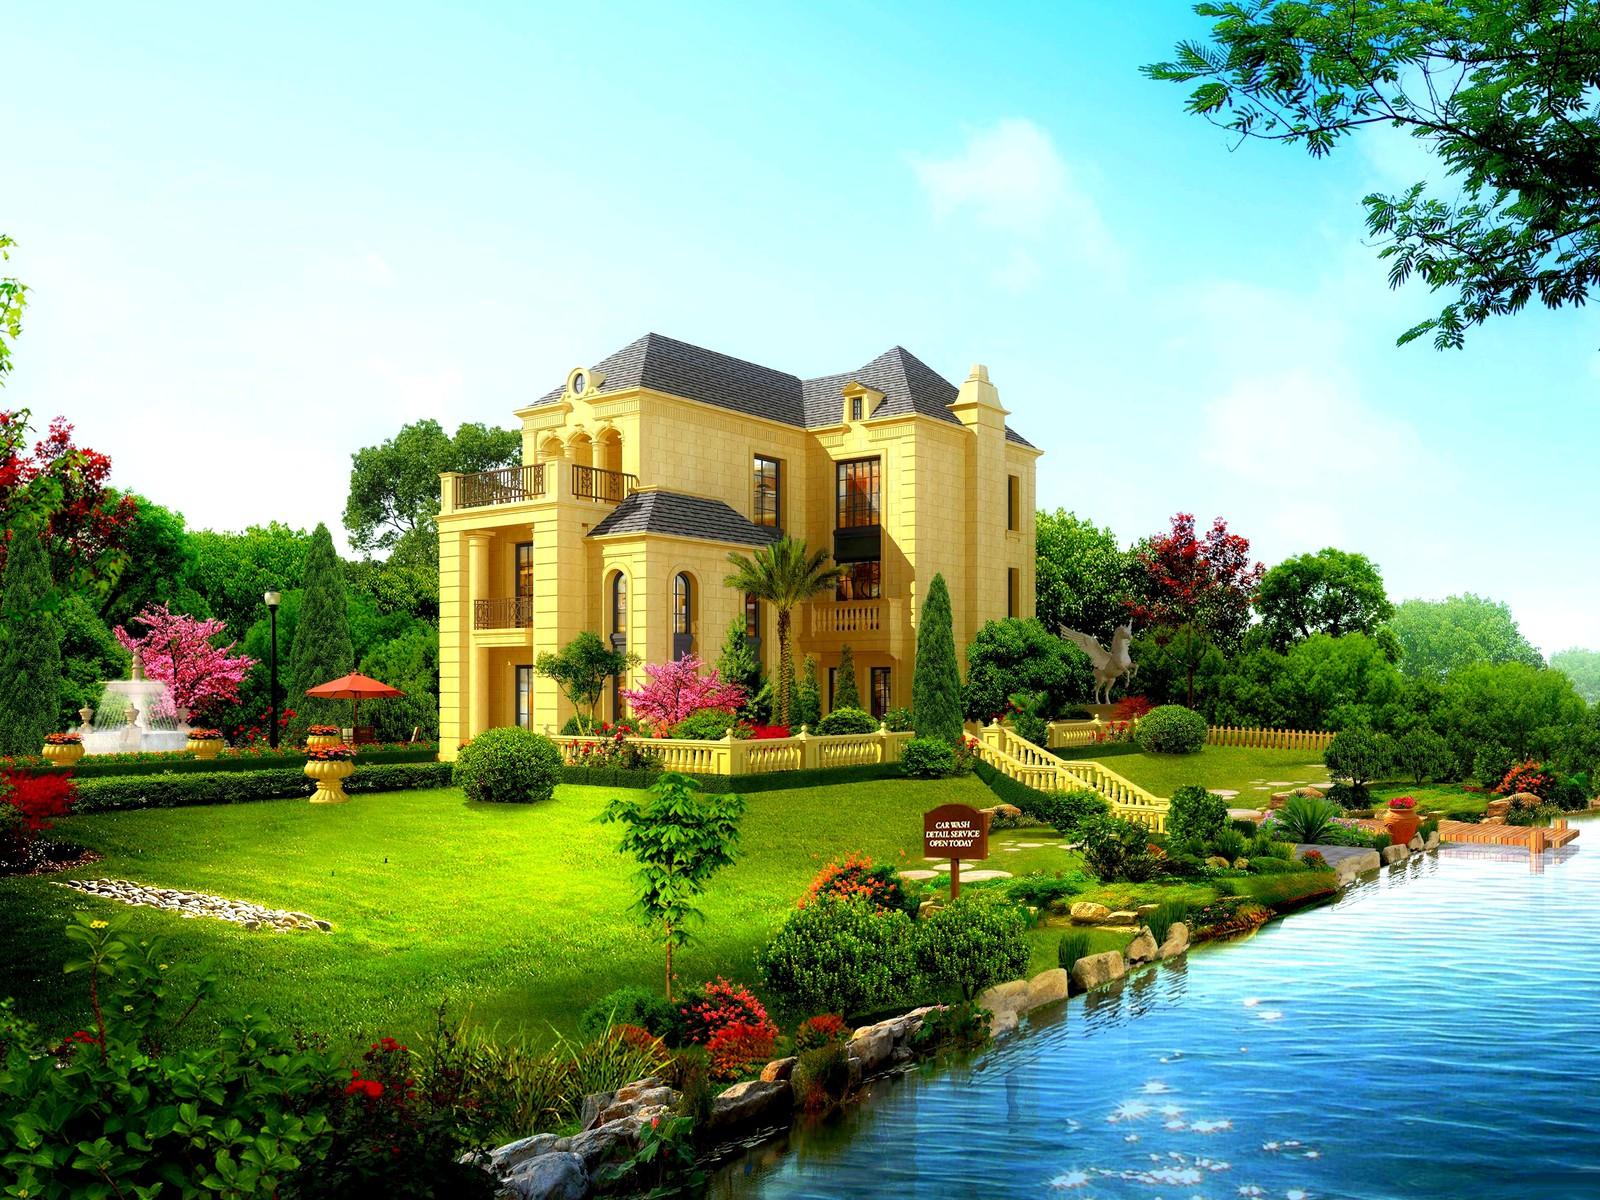 Beautiful house wallpaper 10490 PC en 1600x1200